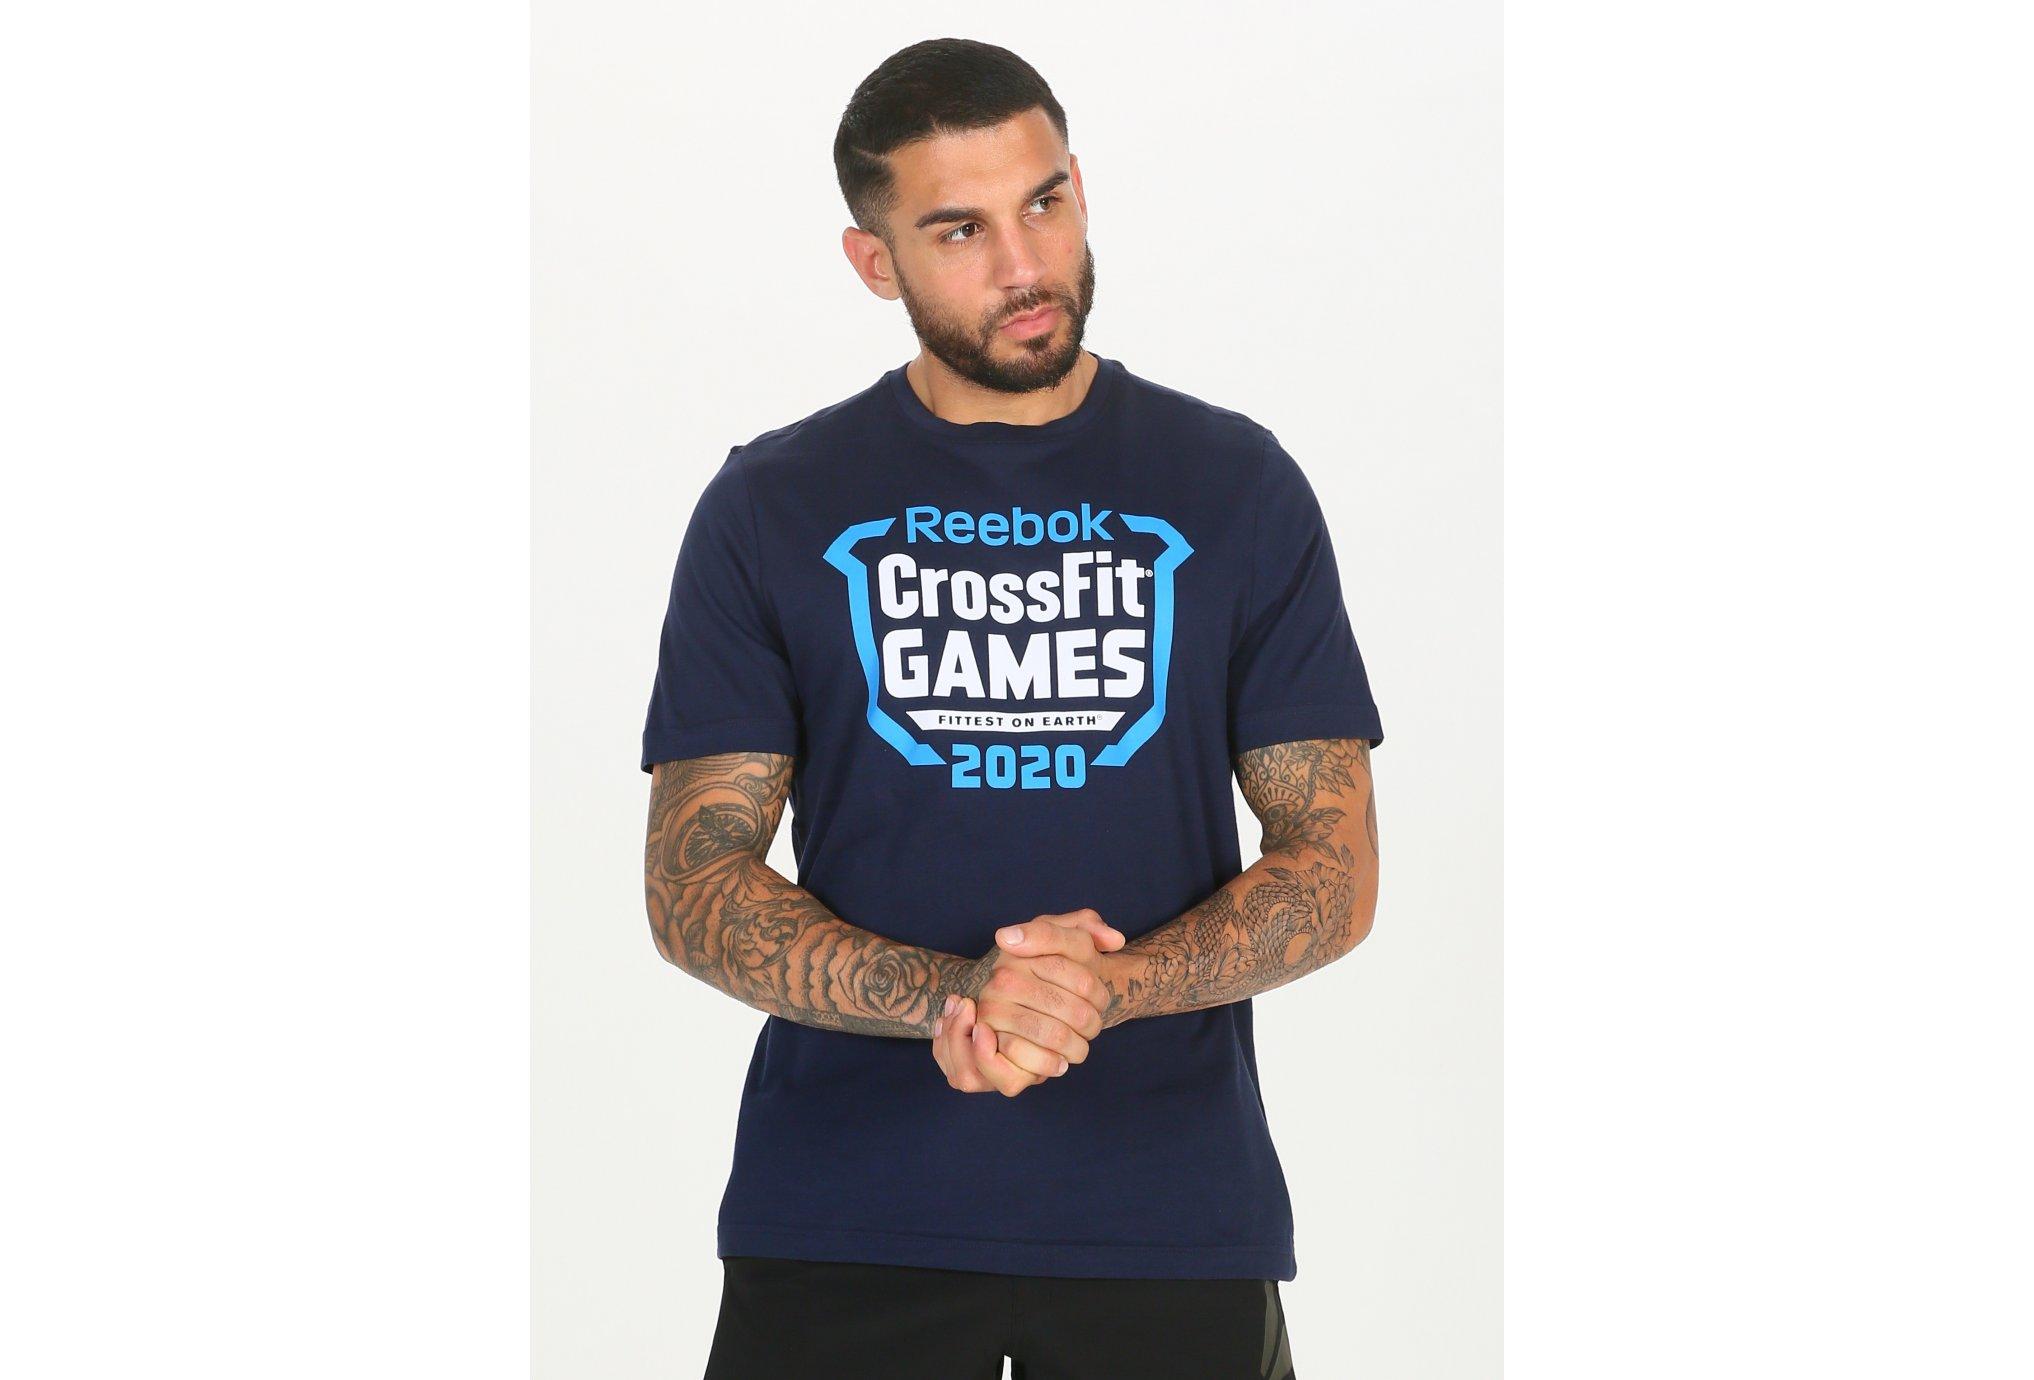 Reebok Crossfit Games Crest M vêtement running homme